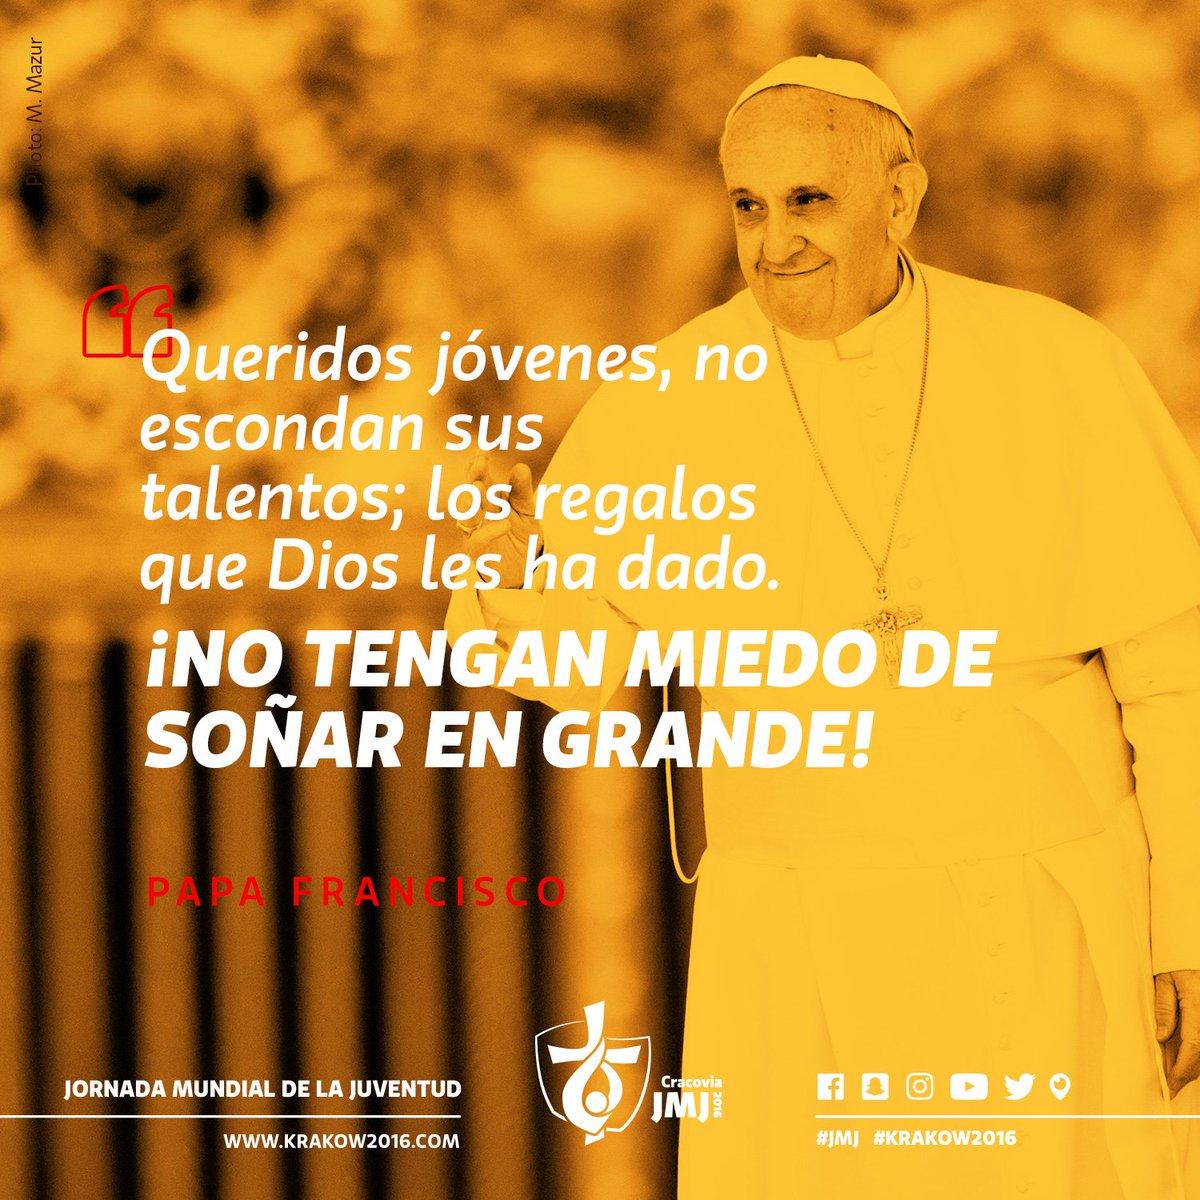 Queridos jóvenes, no escondan sus talentos ¡No tengan miedo de soñar en grande! -Papa Francisco #Krakow2016 #JMJ https://t.co/XGHWq9Tek7